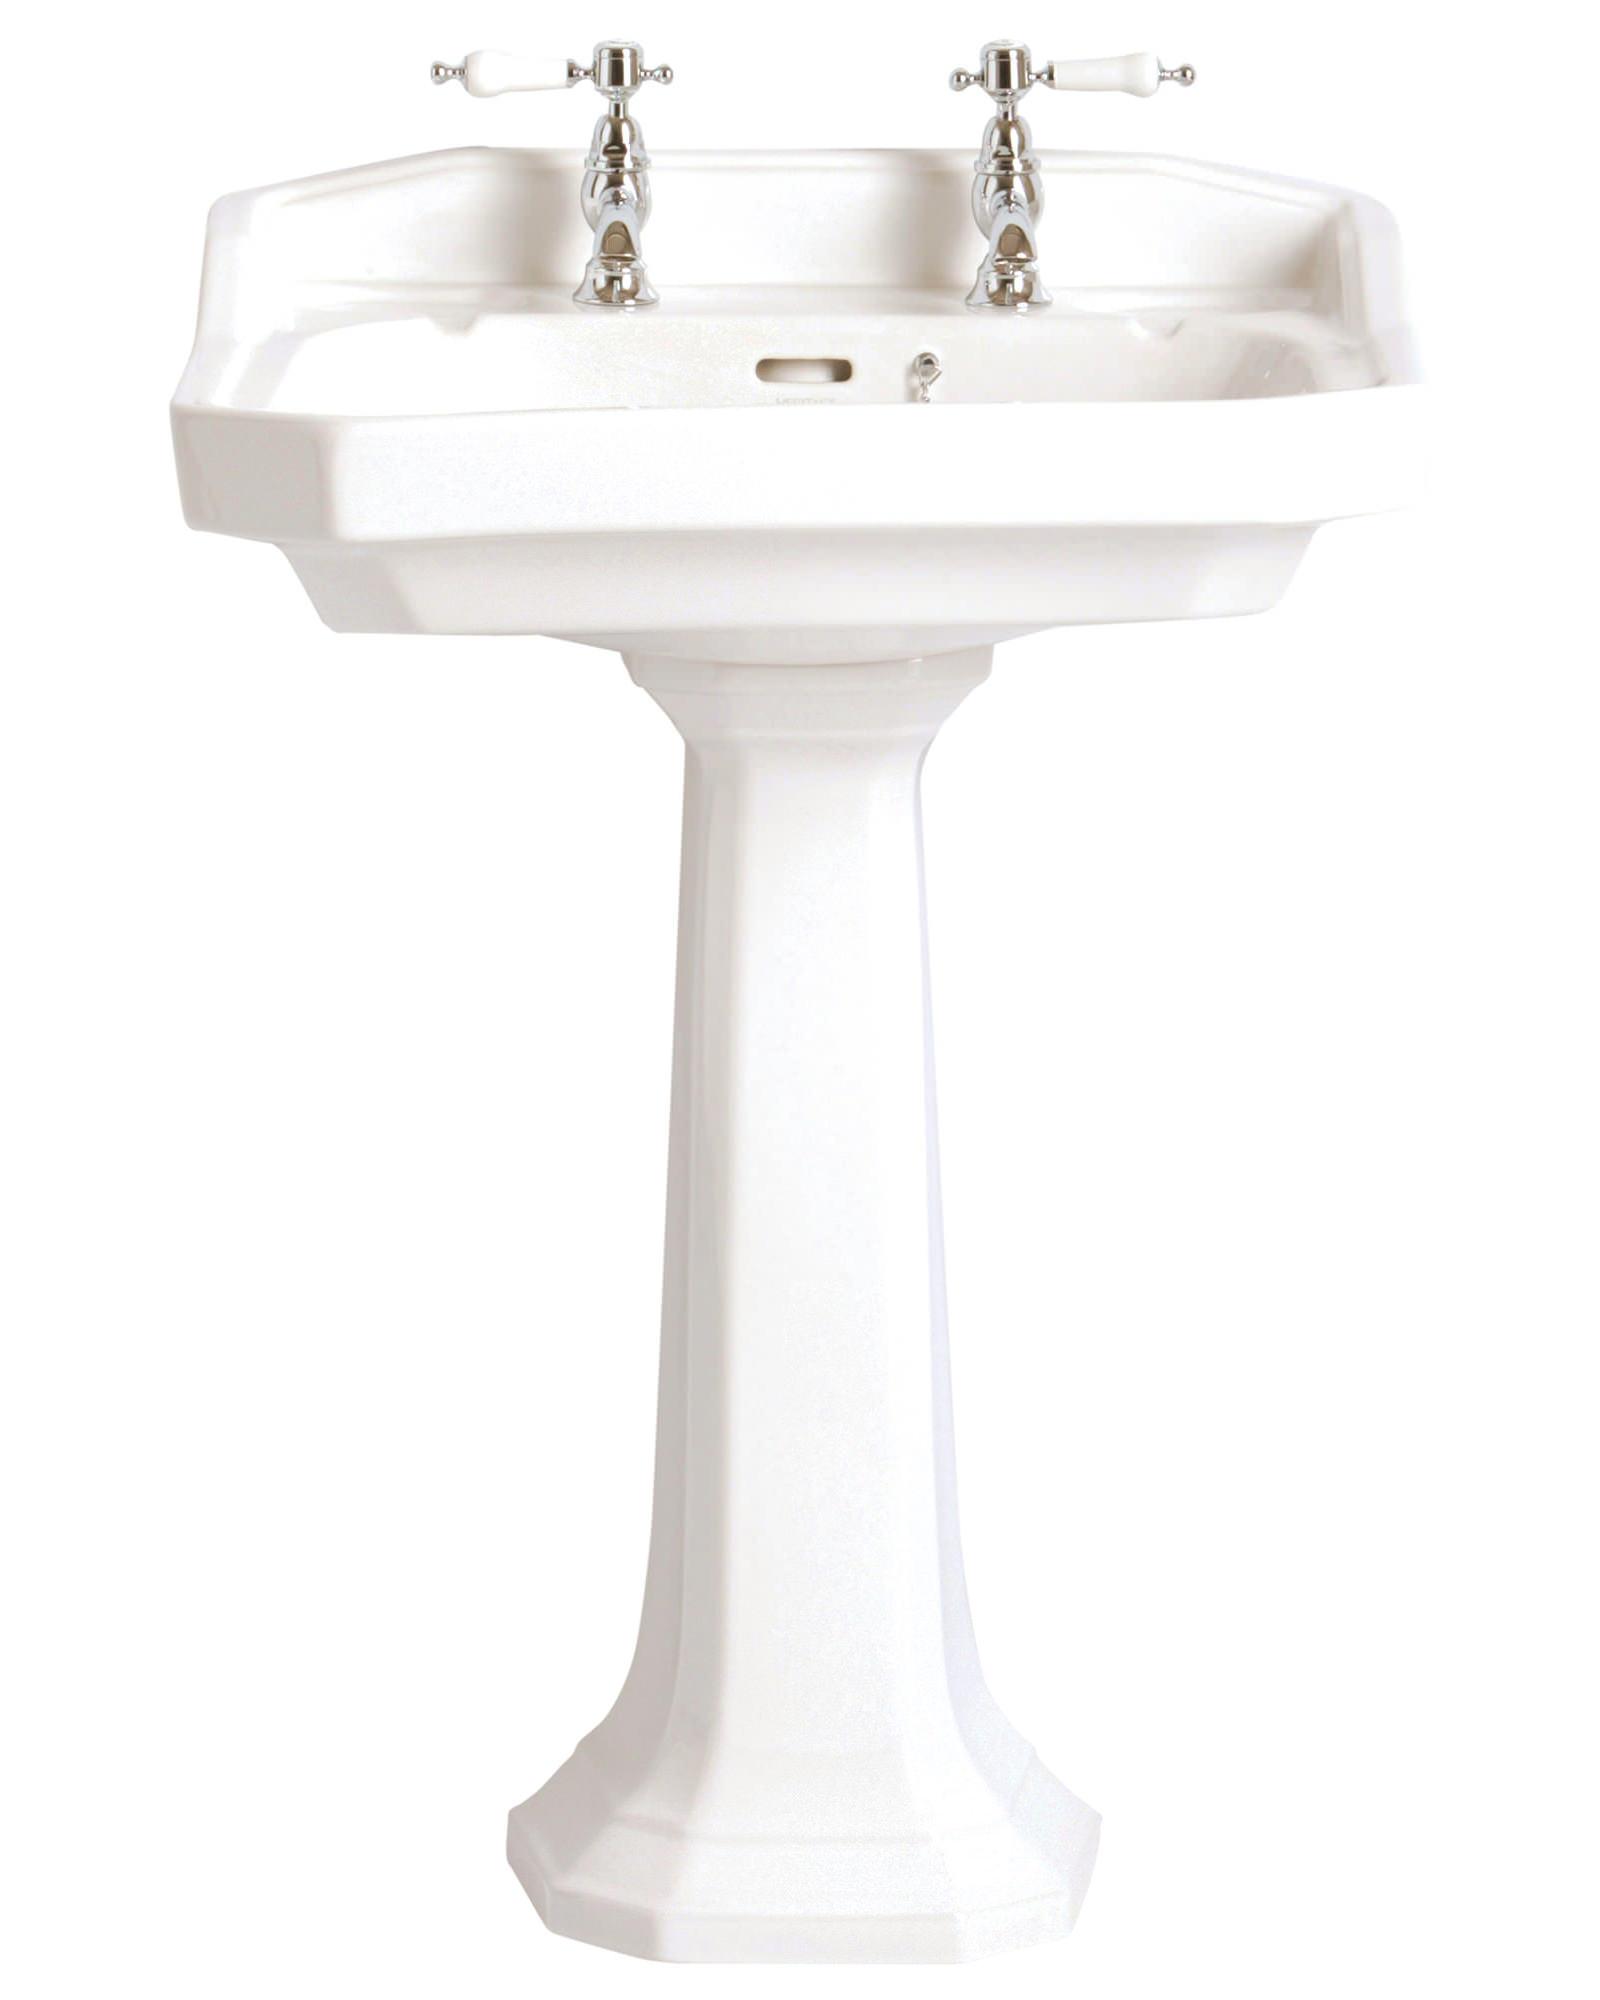 Bathroom Basin: Heritage Granley 610mm 1 Taphole Standard Basin